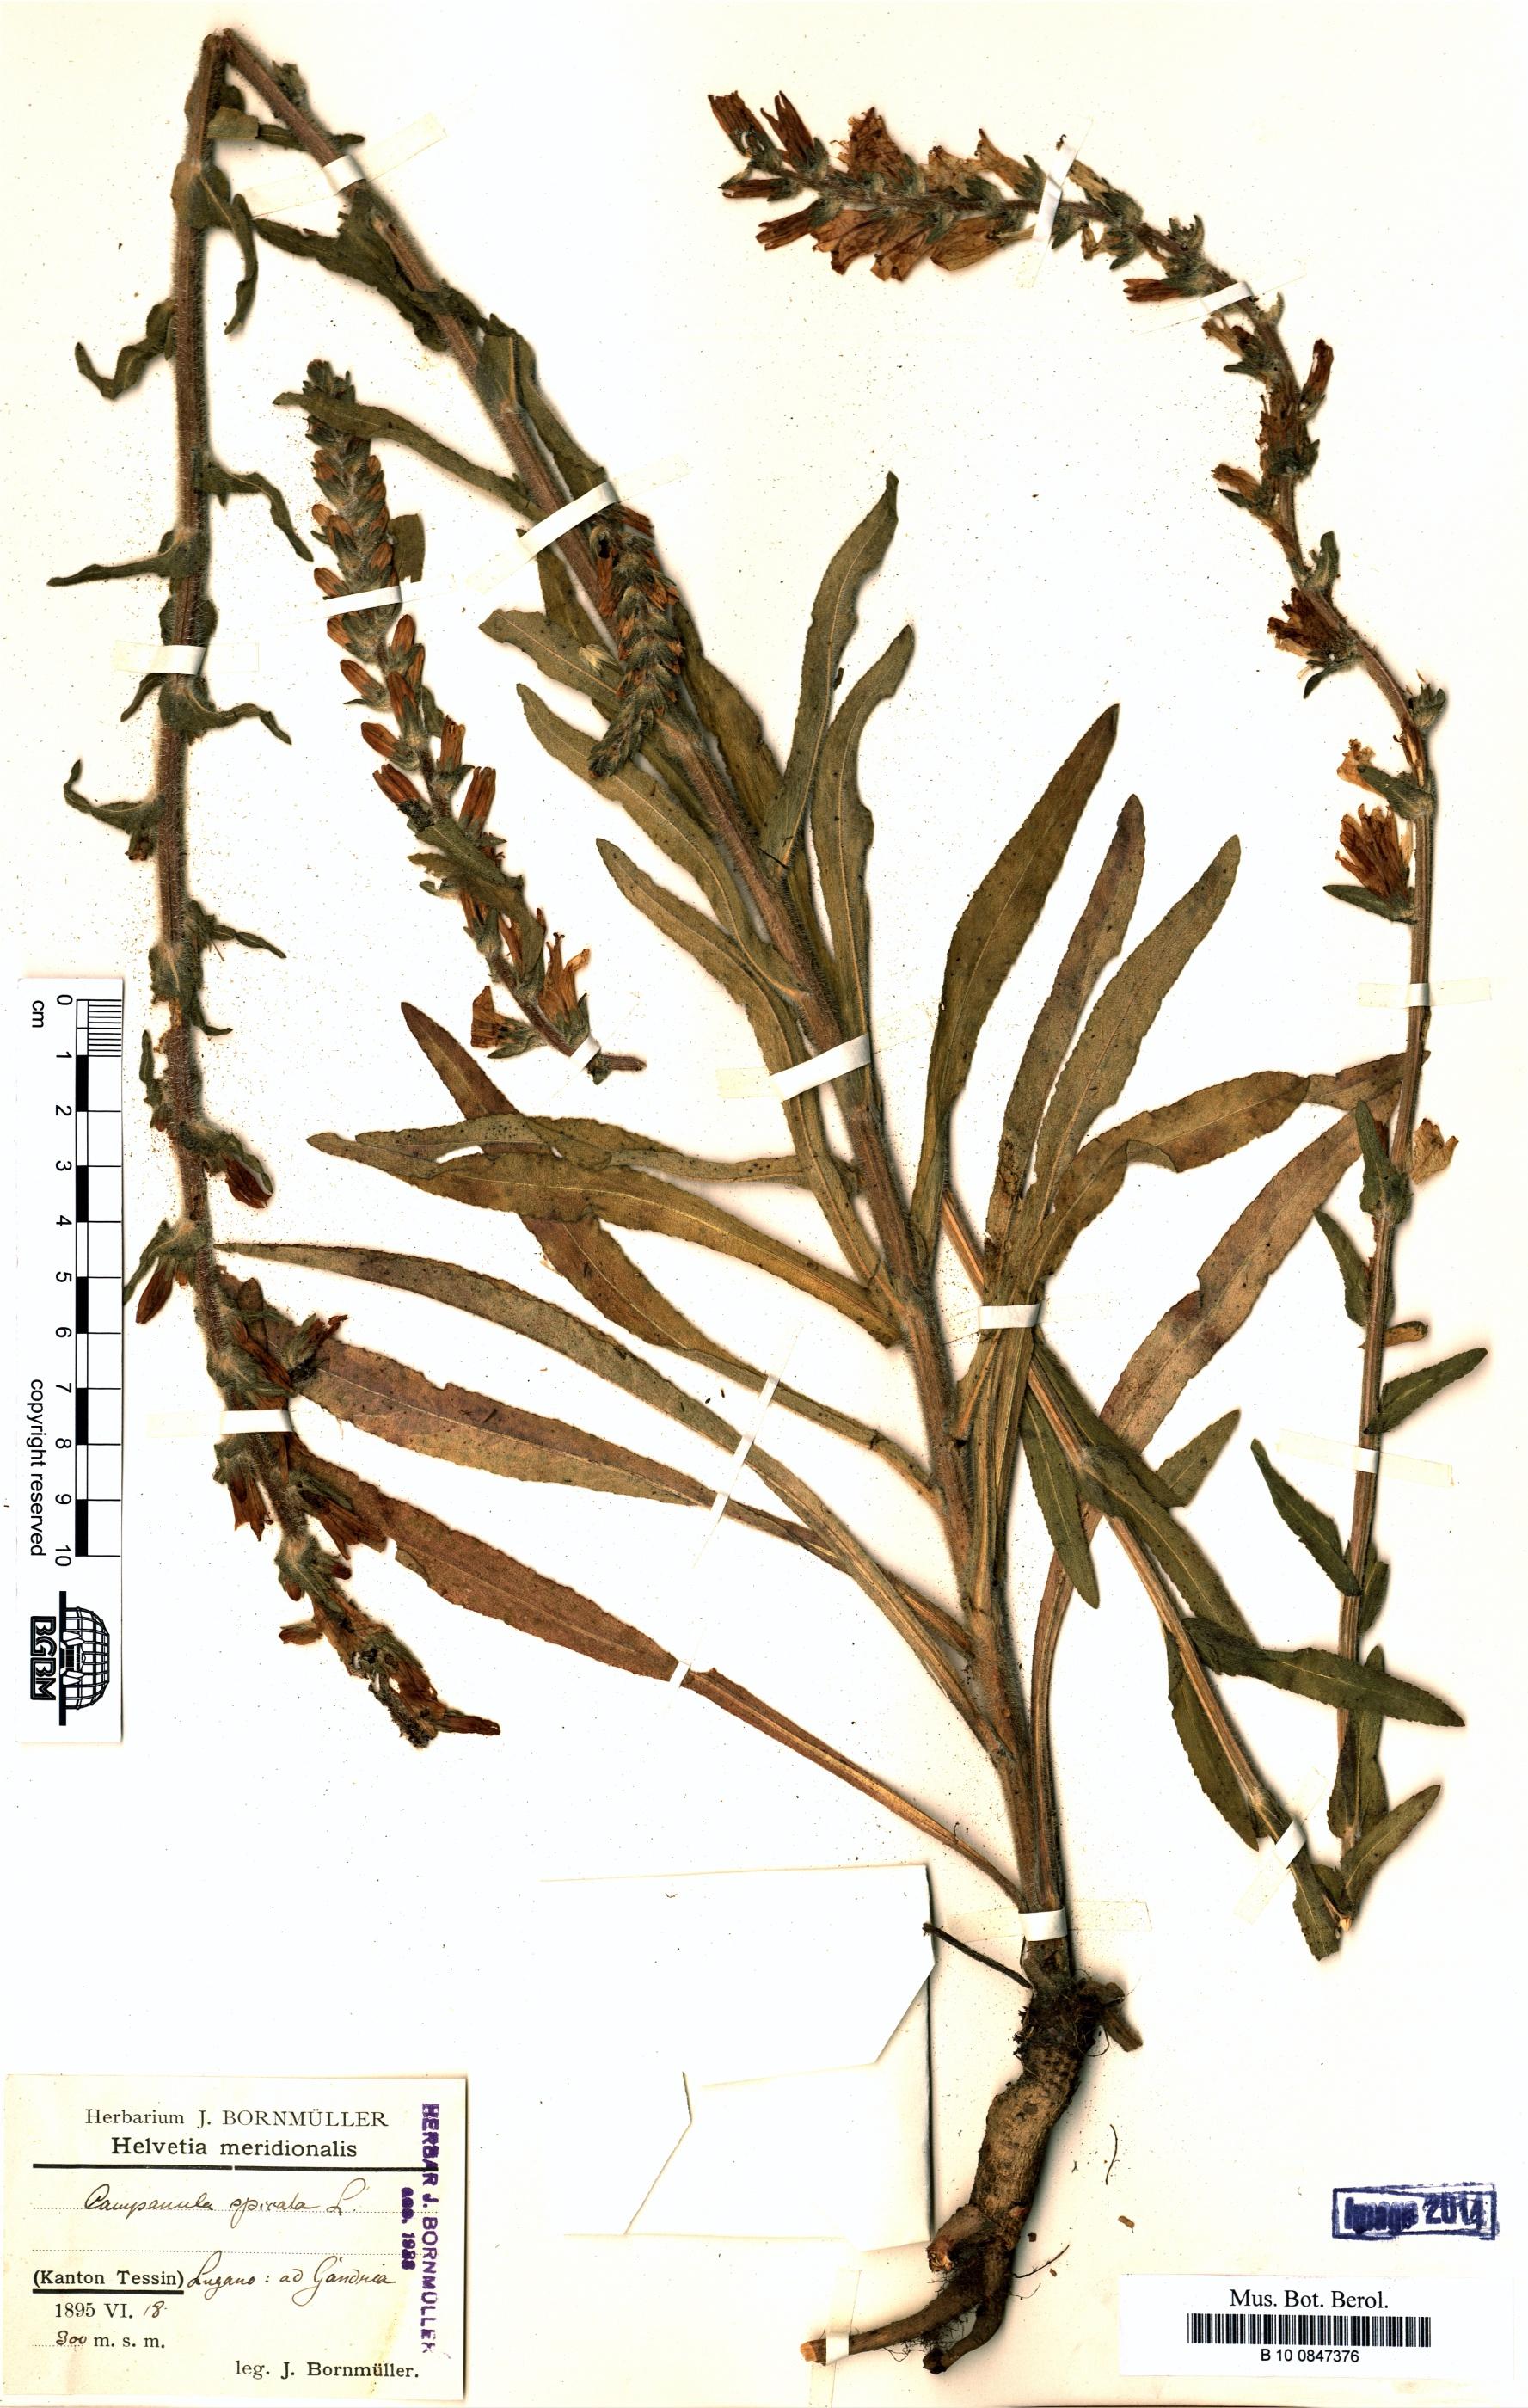 http://ww2.bgbm.org/herbarium/images/B/10/08/47/37/B_10_0847376.jpg